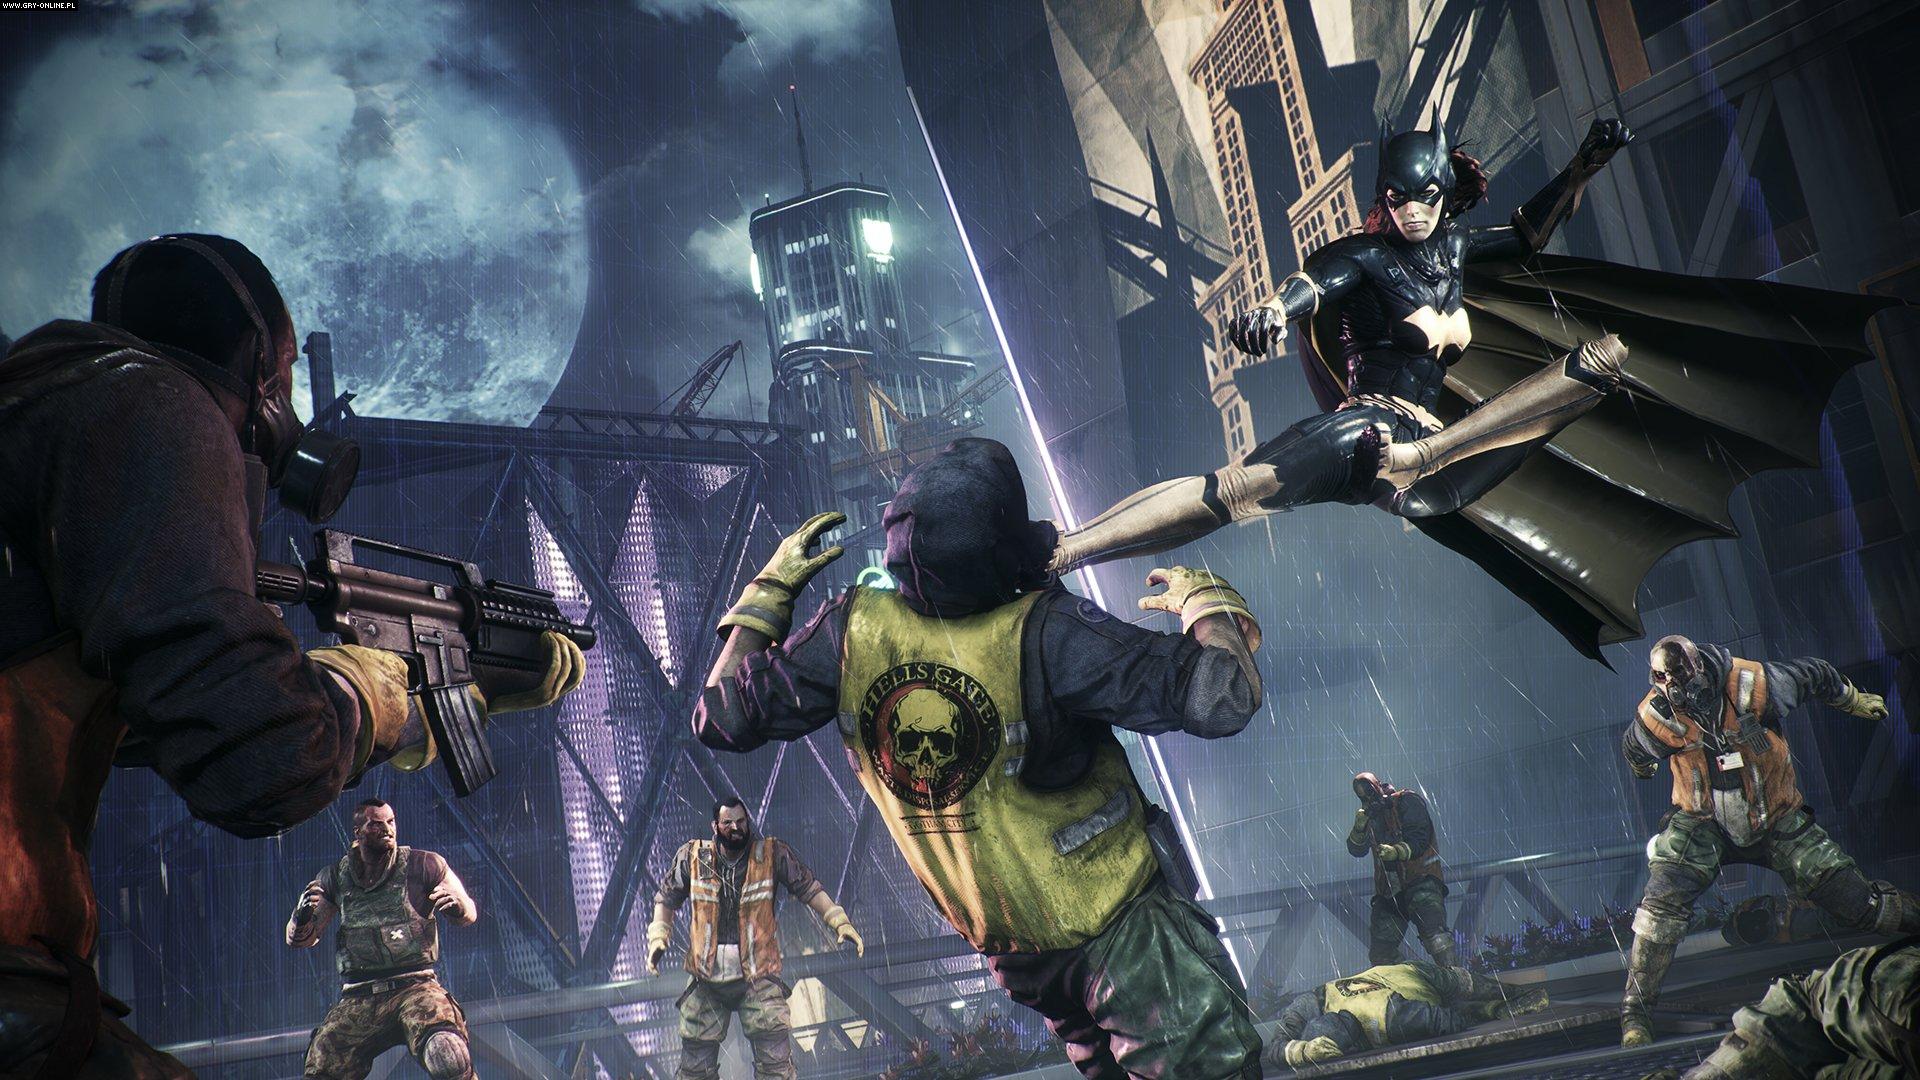 Batman: Arkham Knight PC, PS4, XONE Games Image 3/63, RockSteady Studios, Warner Bros Interactive Entertainment